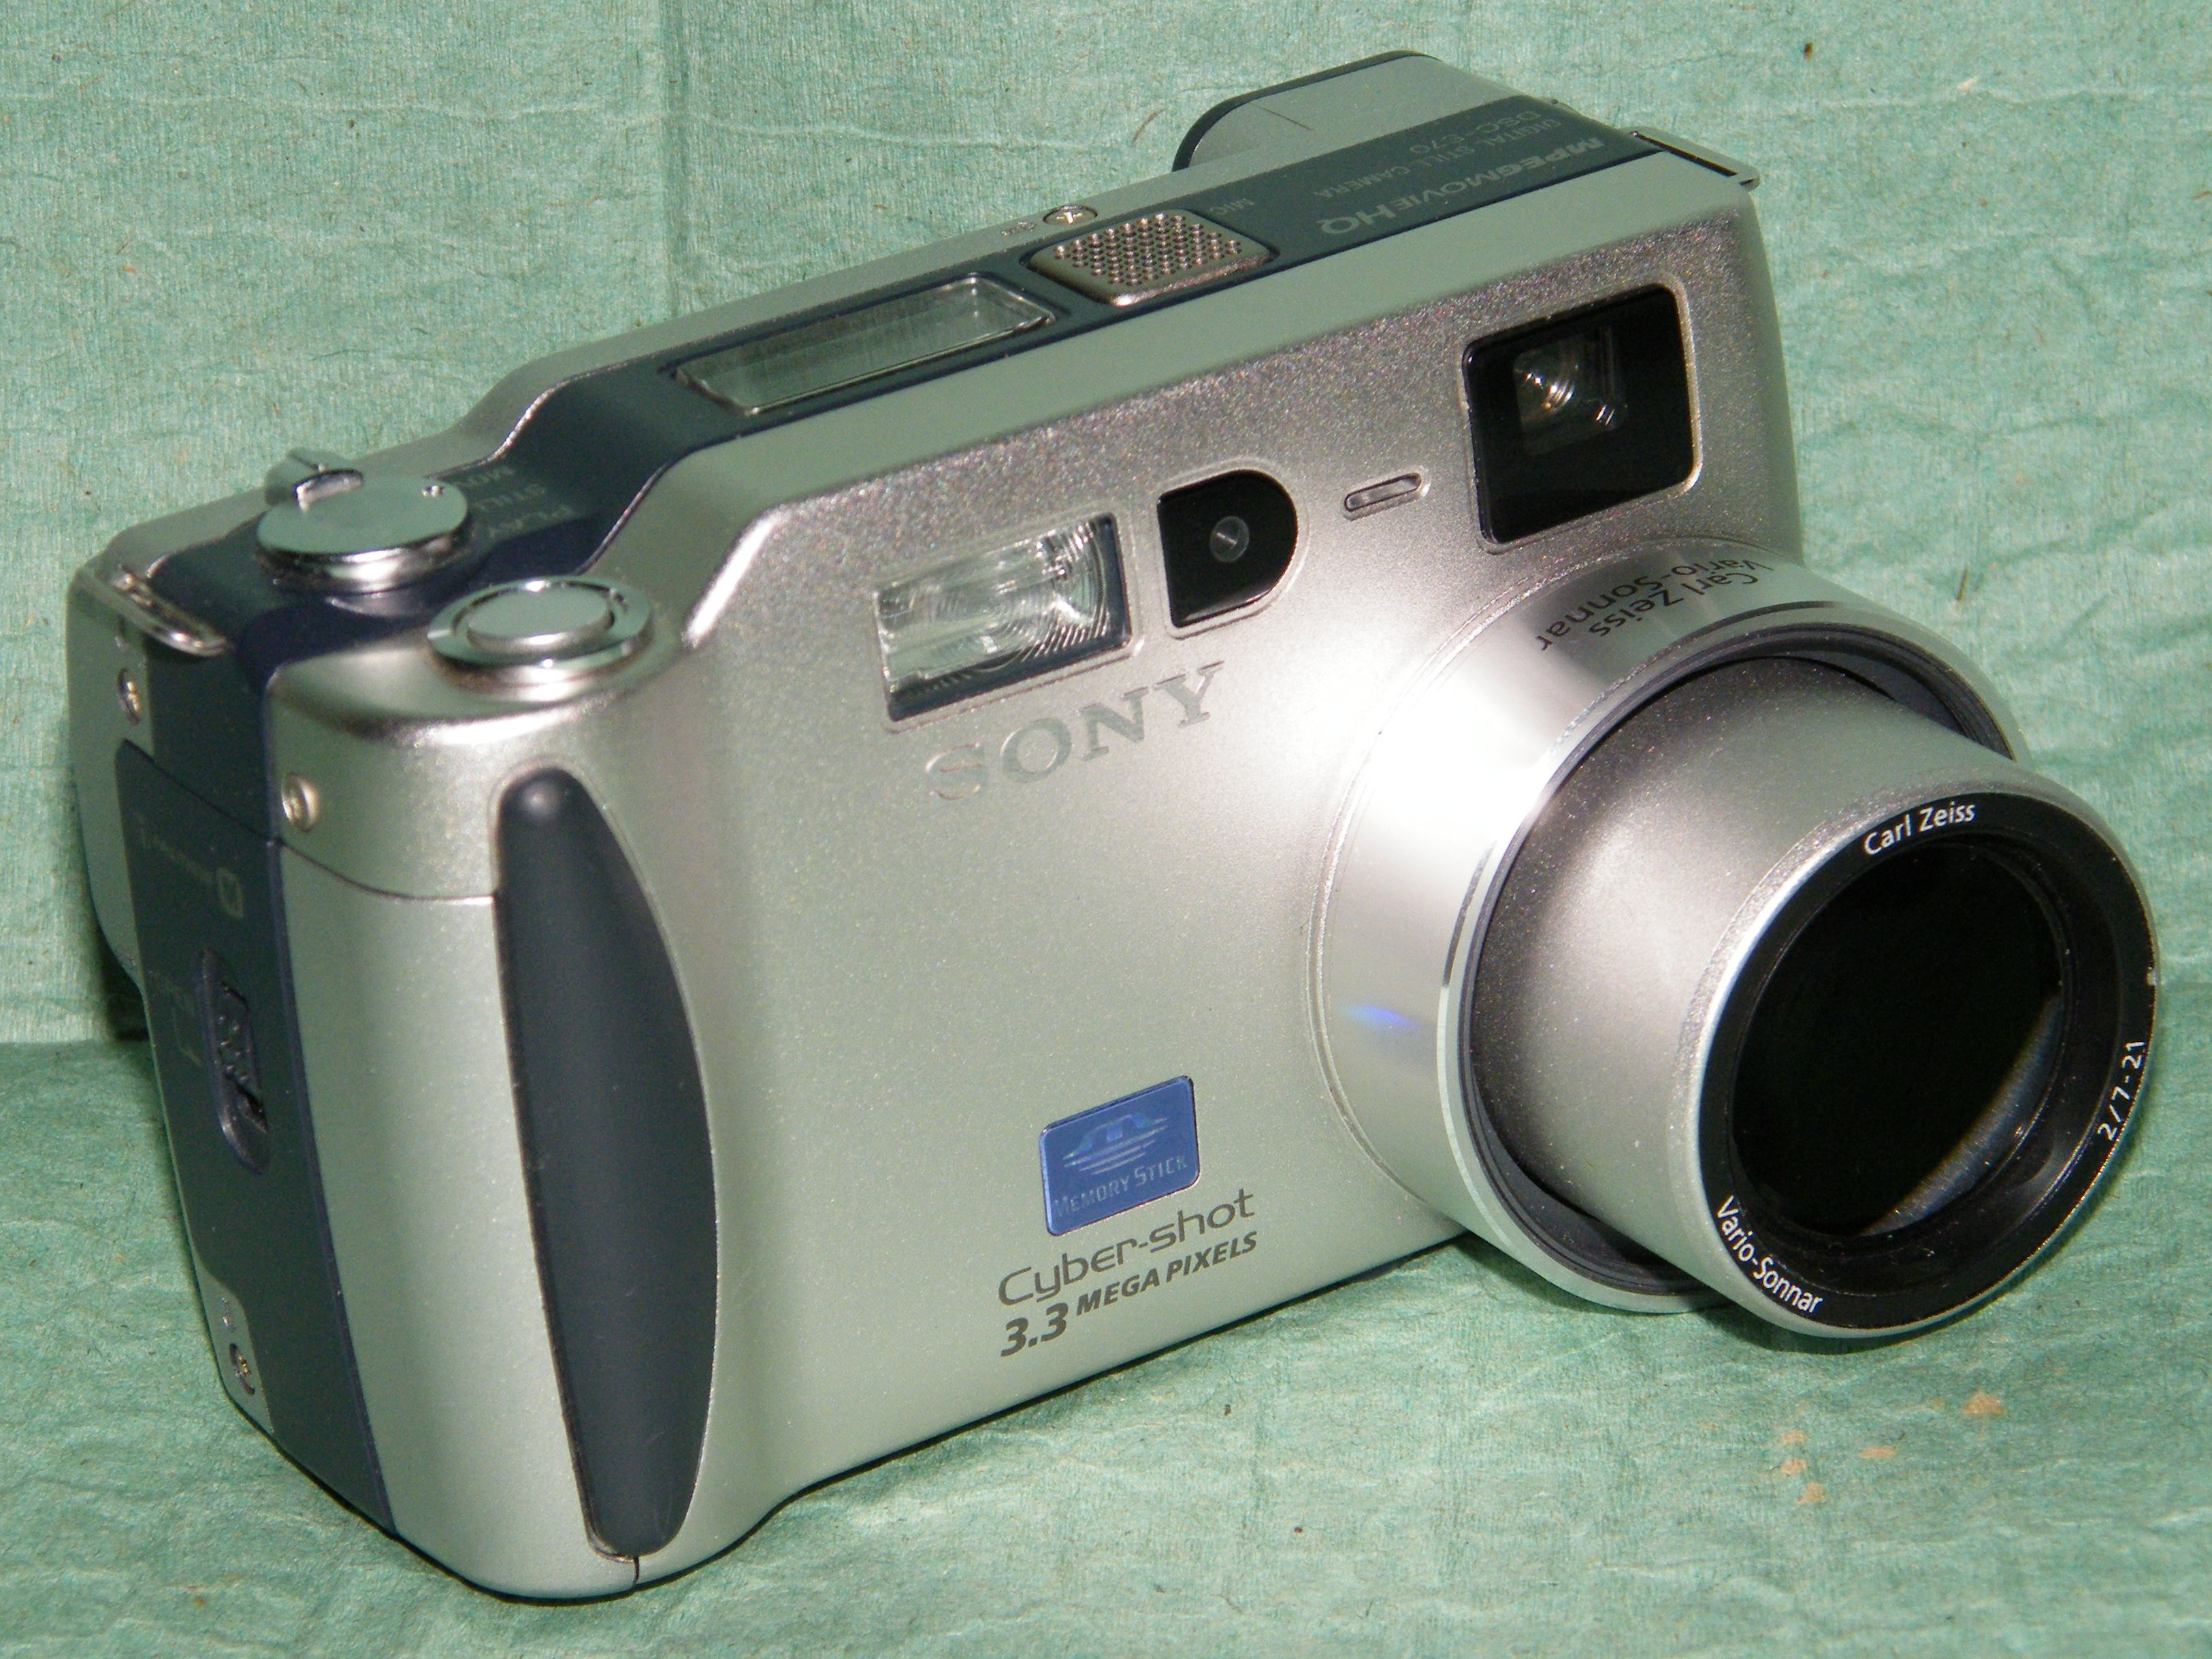 Sony DSC-S70 Camera USB Download Drivers